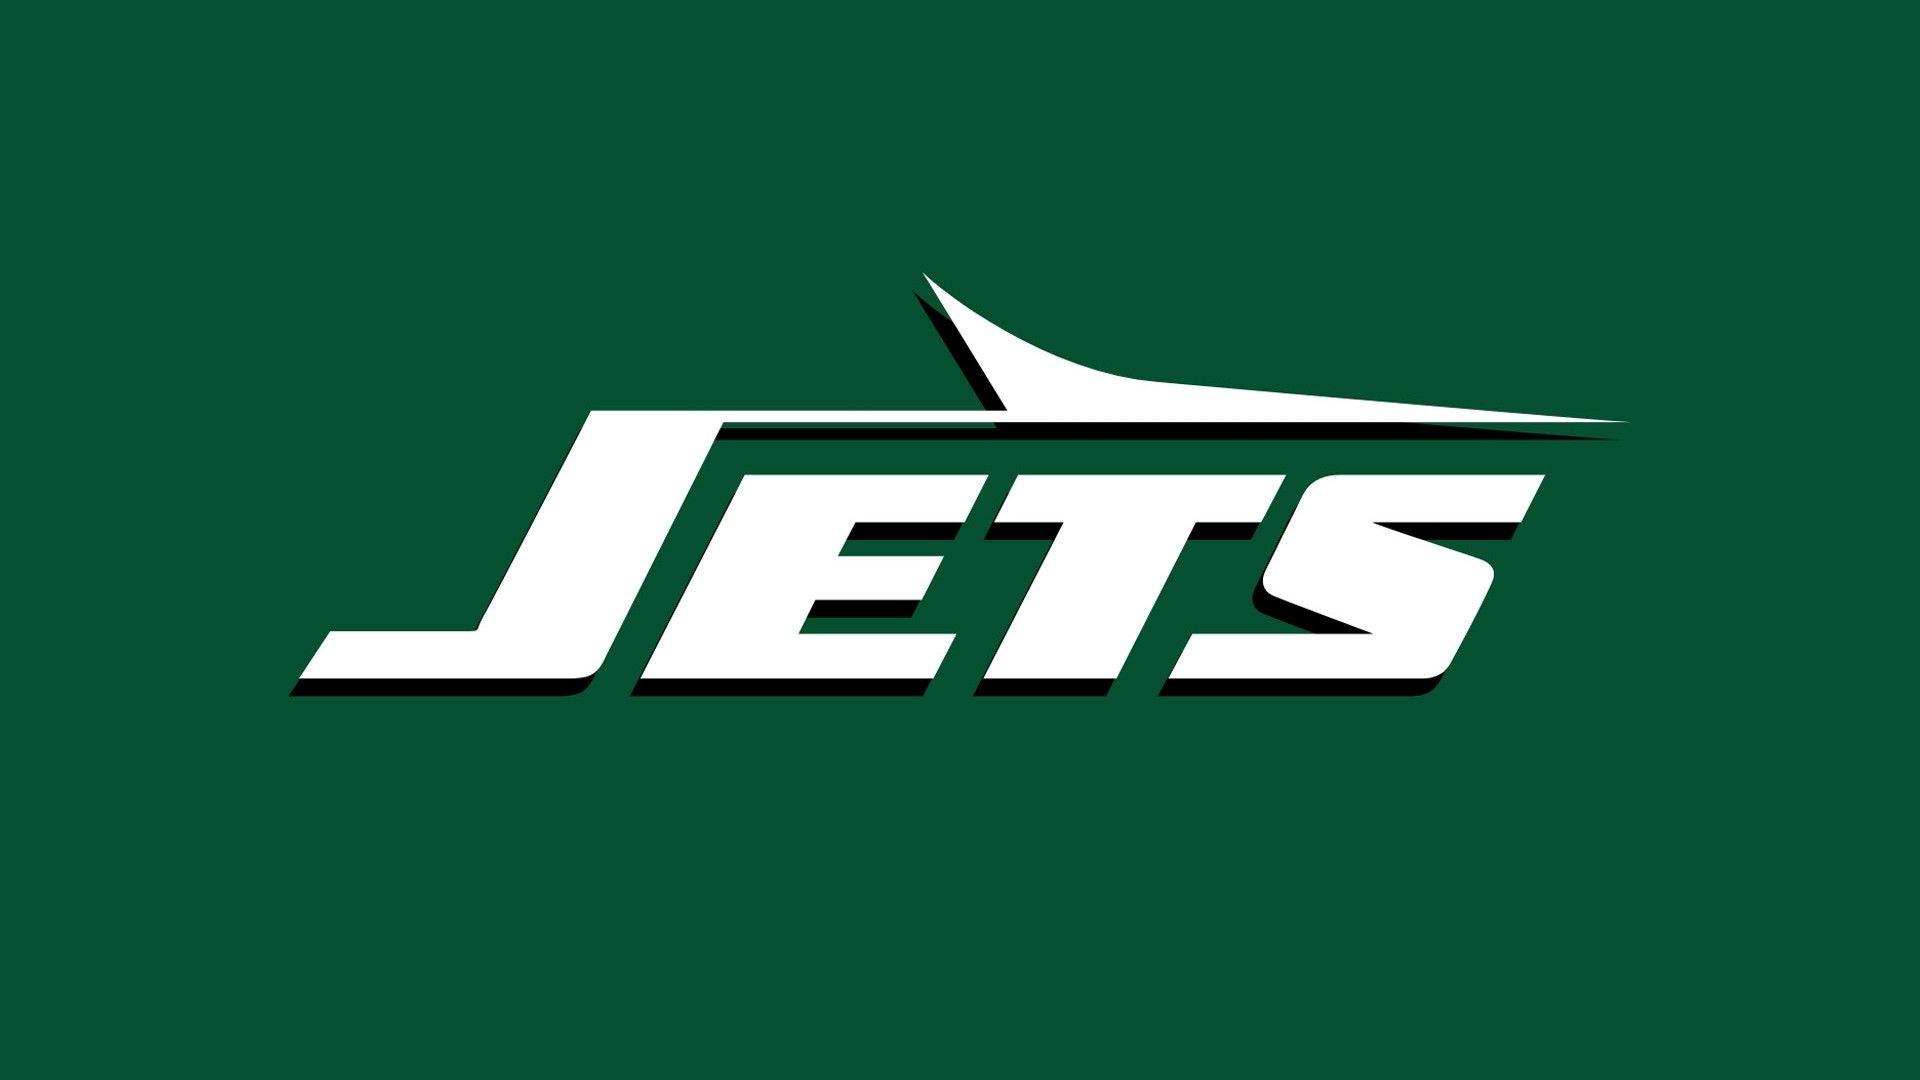 Wallpaper Desktop New York Jets Hd New York Jets Football New